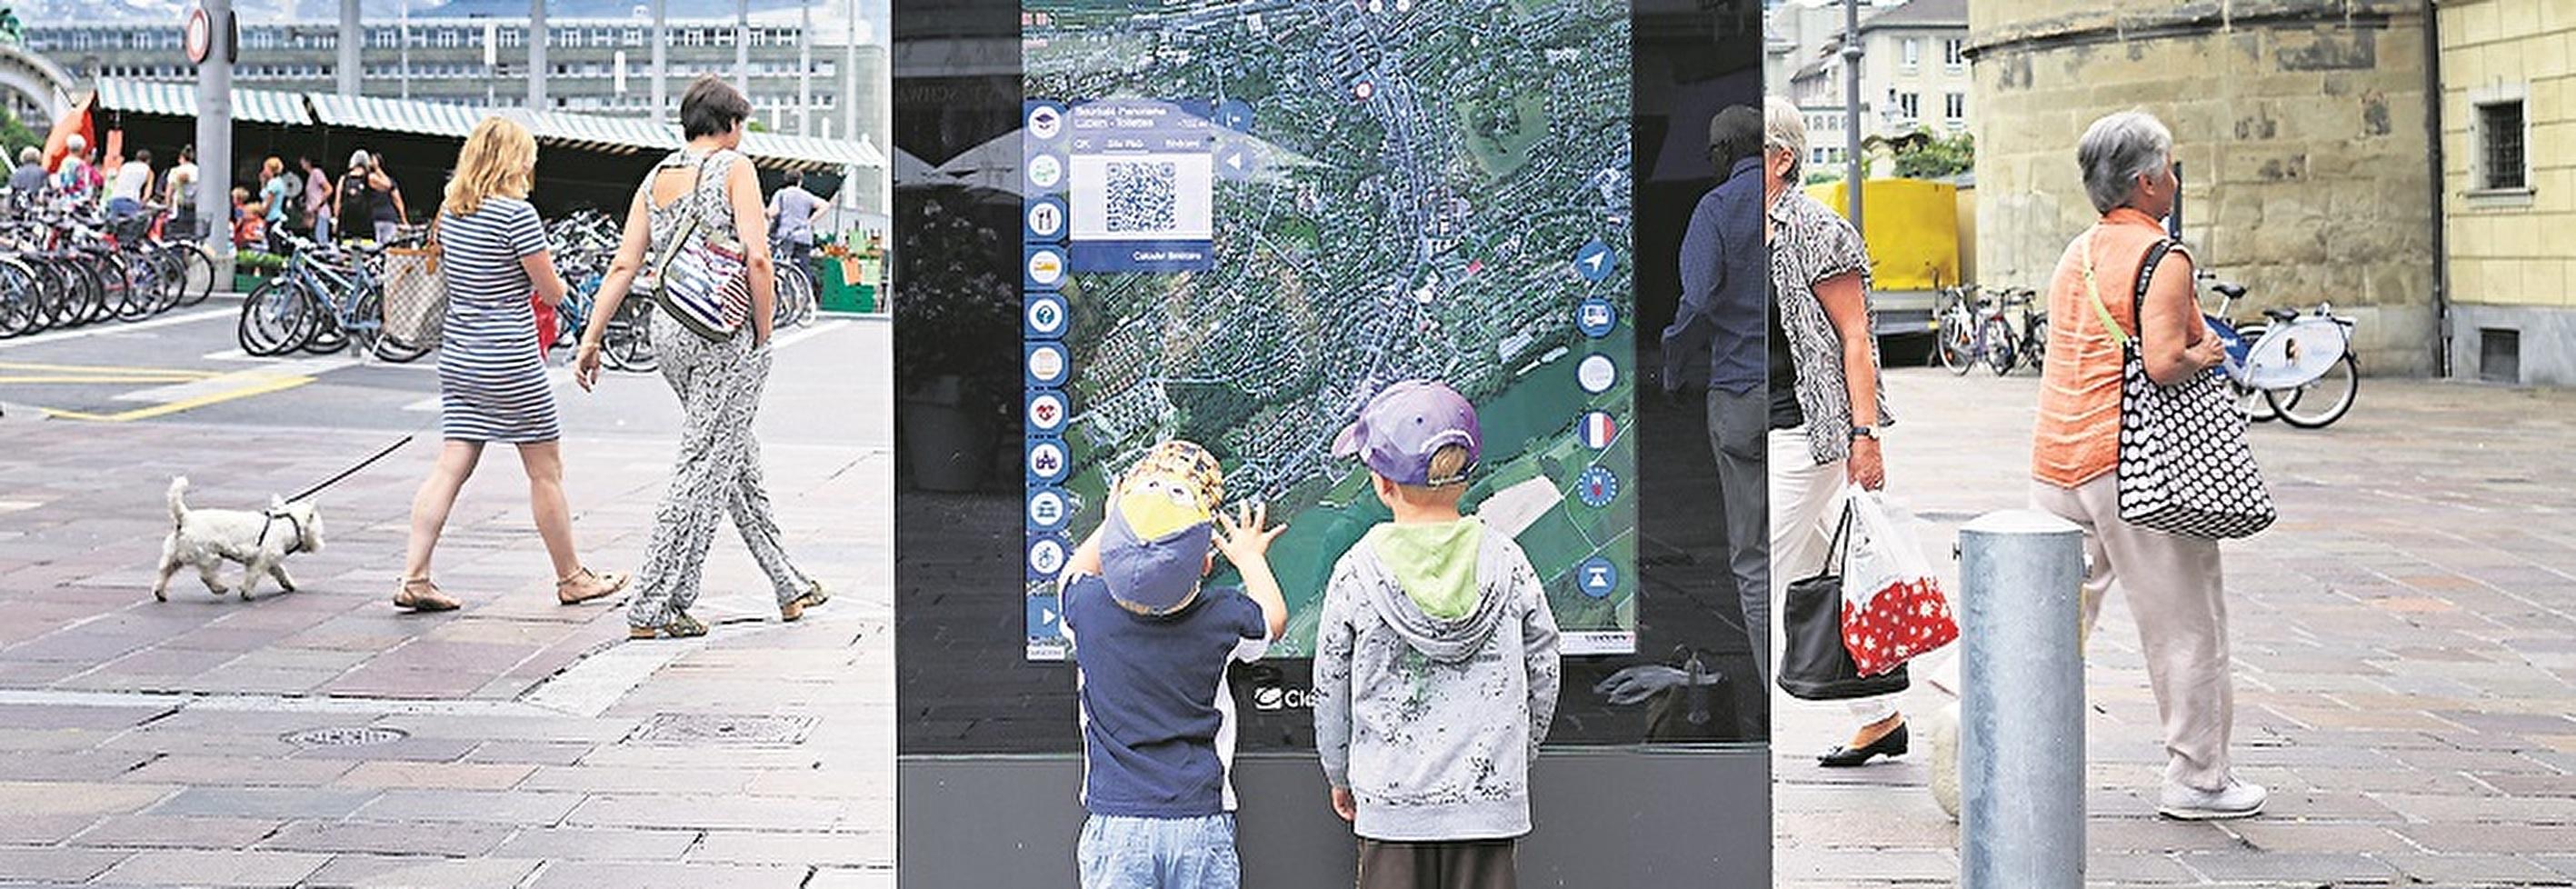 Zehn digitale Werbescreens mit interaktivem Stadtplan